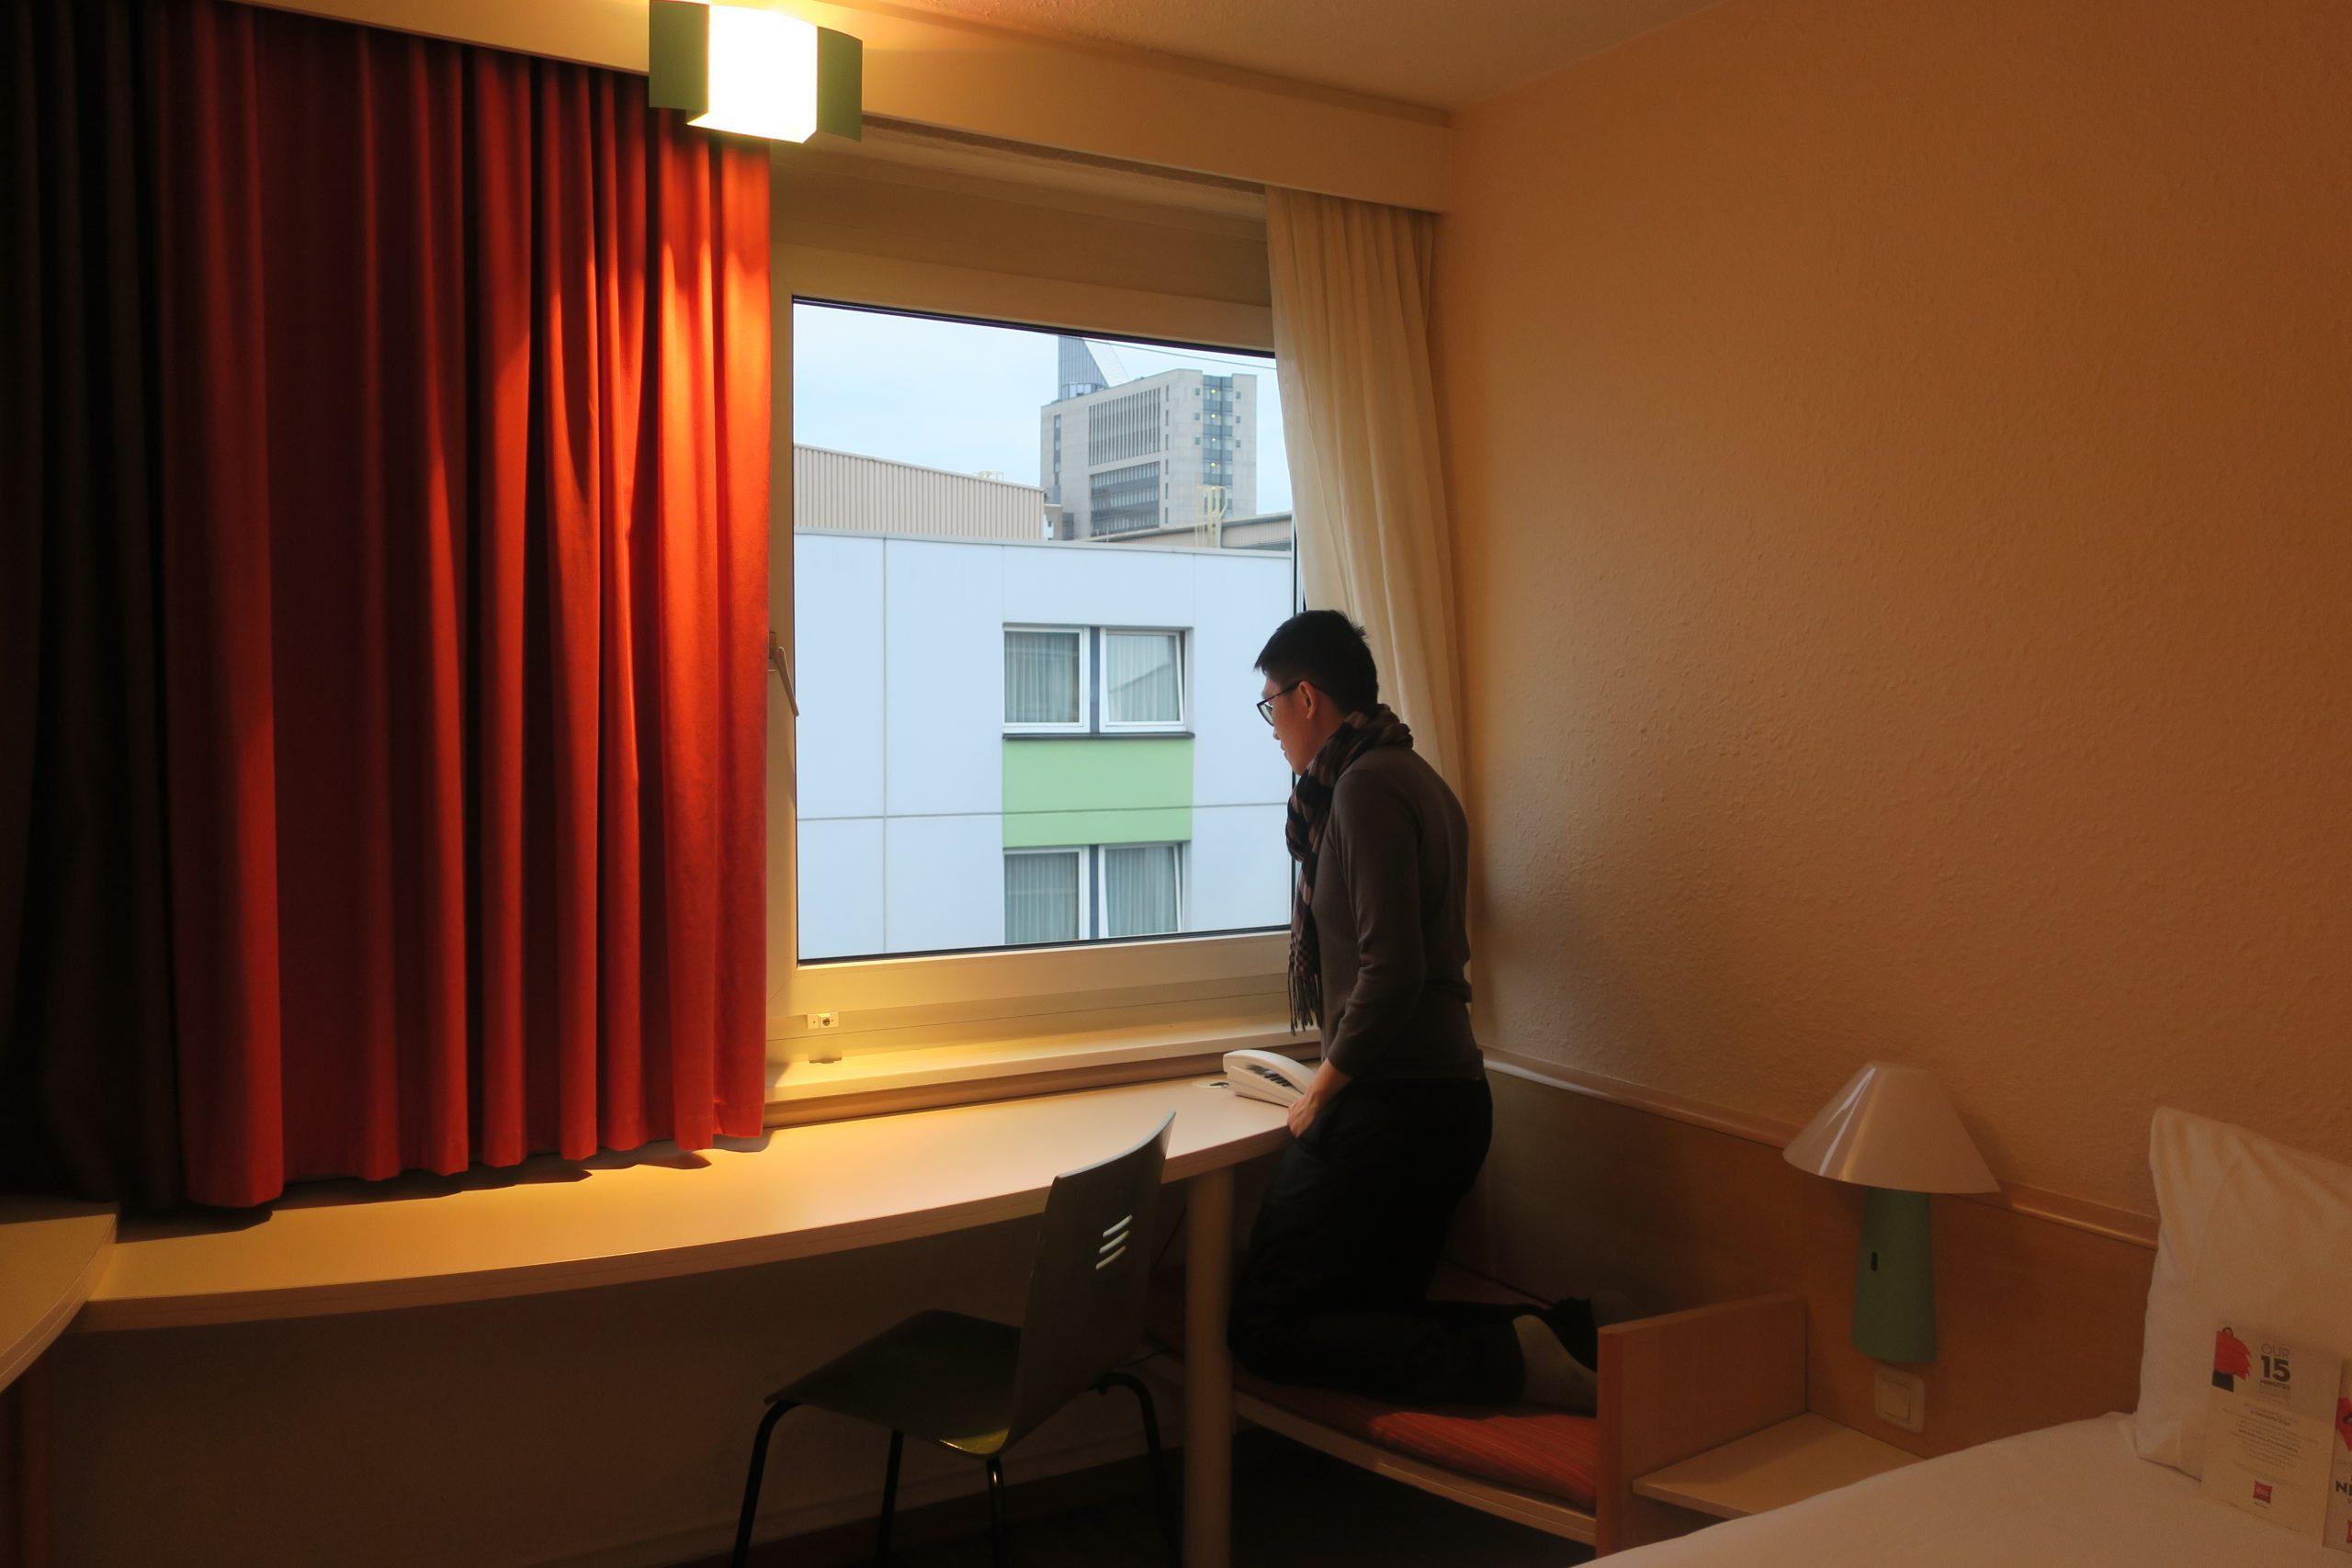 Hotel Ibis Duesseldorf Hauptbahnhof Room